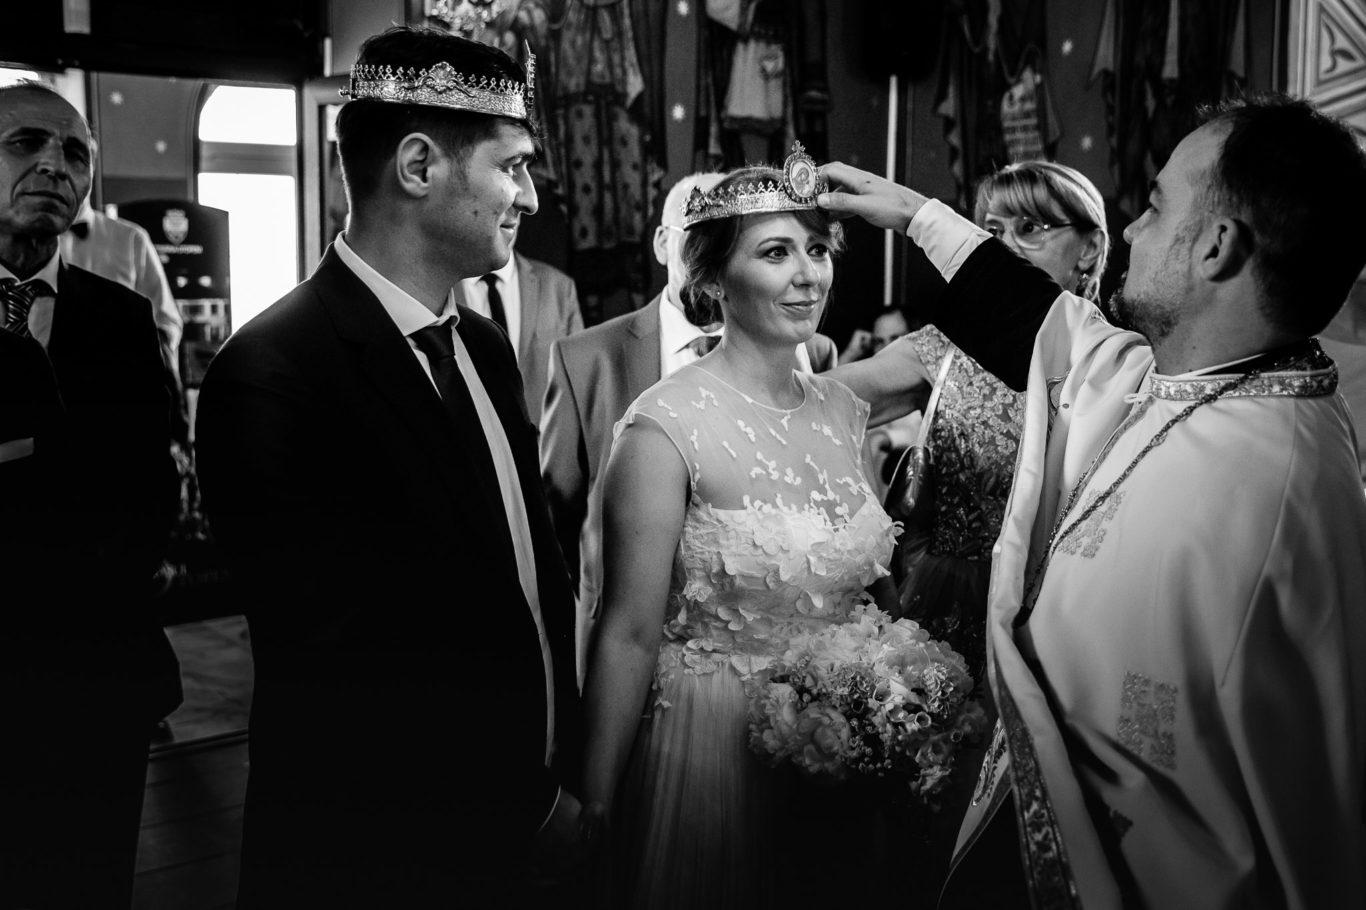 0170-Fotografie-nunta-botez-Ingrid-Geta-Mihai-fotograf-Ciprian-Dumitrescu-IMG_1528